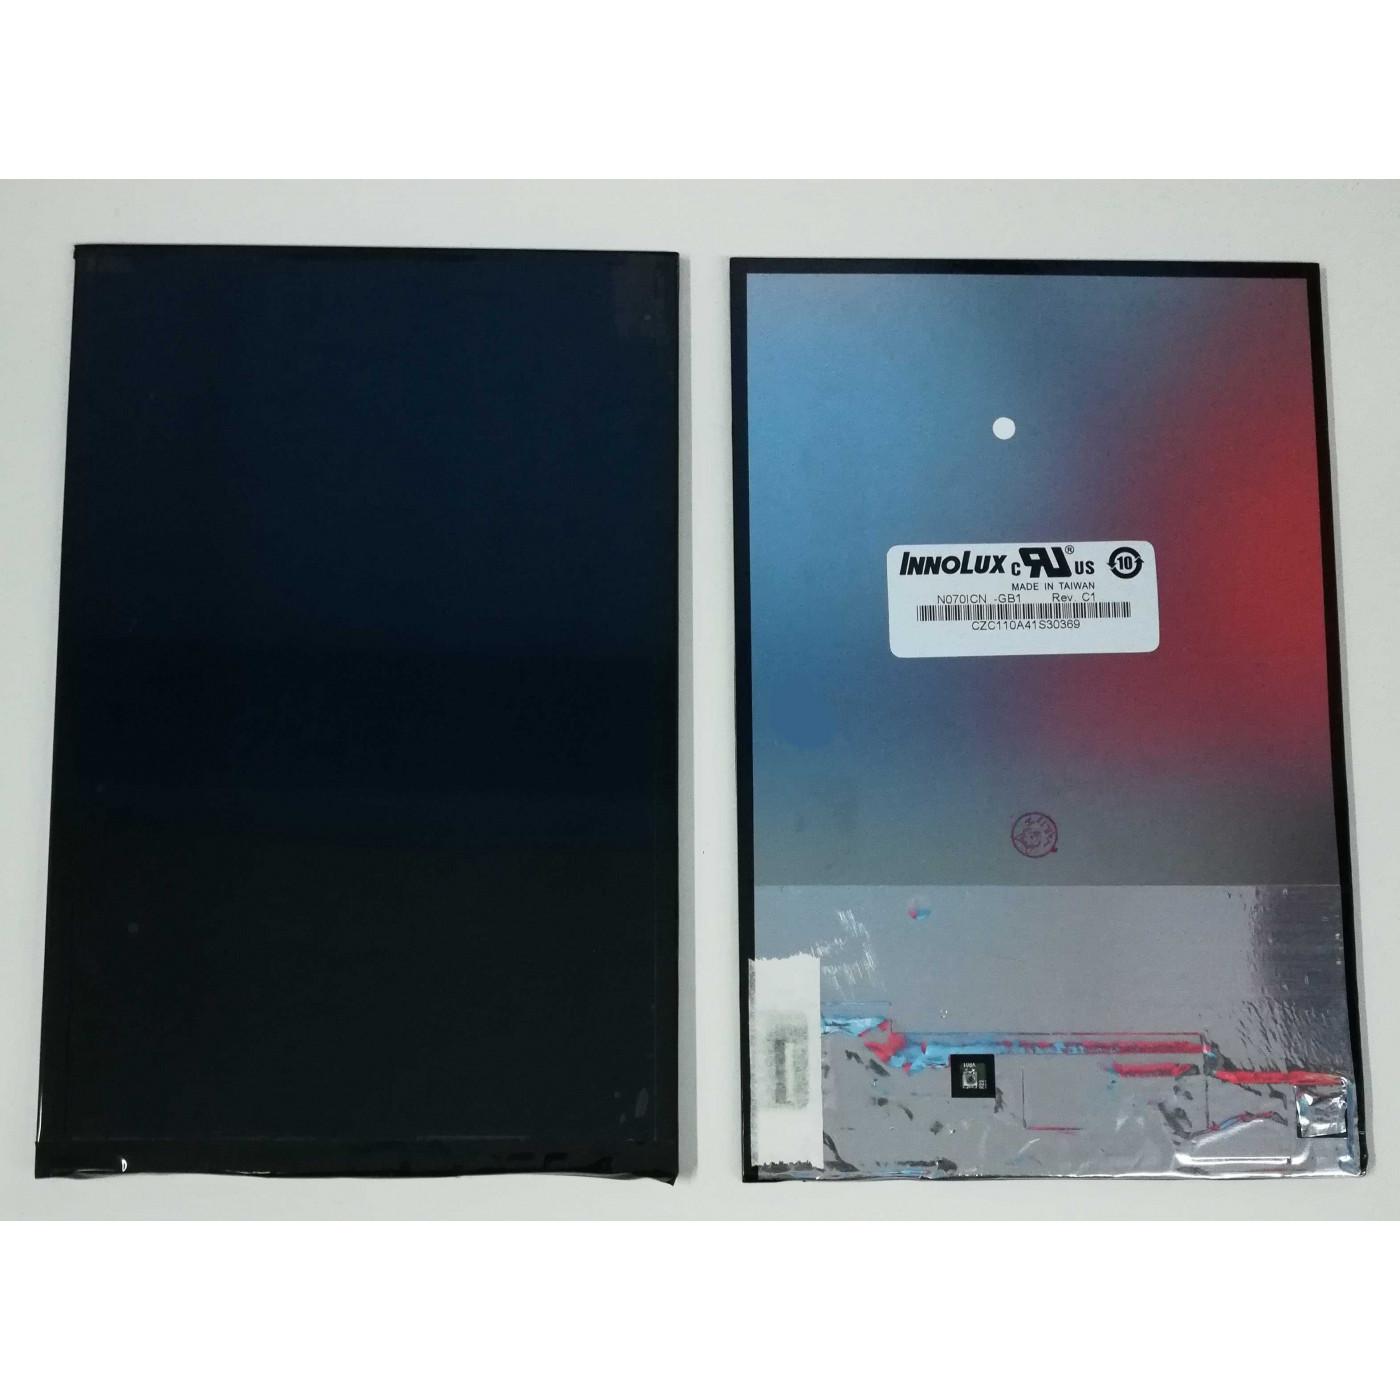 LCD DISPLAY PARI ORIGINALE PER Asus Fonepad 7 K00E ME175CG K00Y K00Z SCHERMO MONITOR 7.0